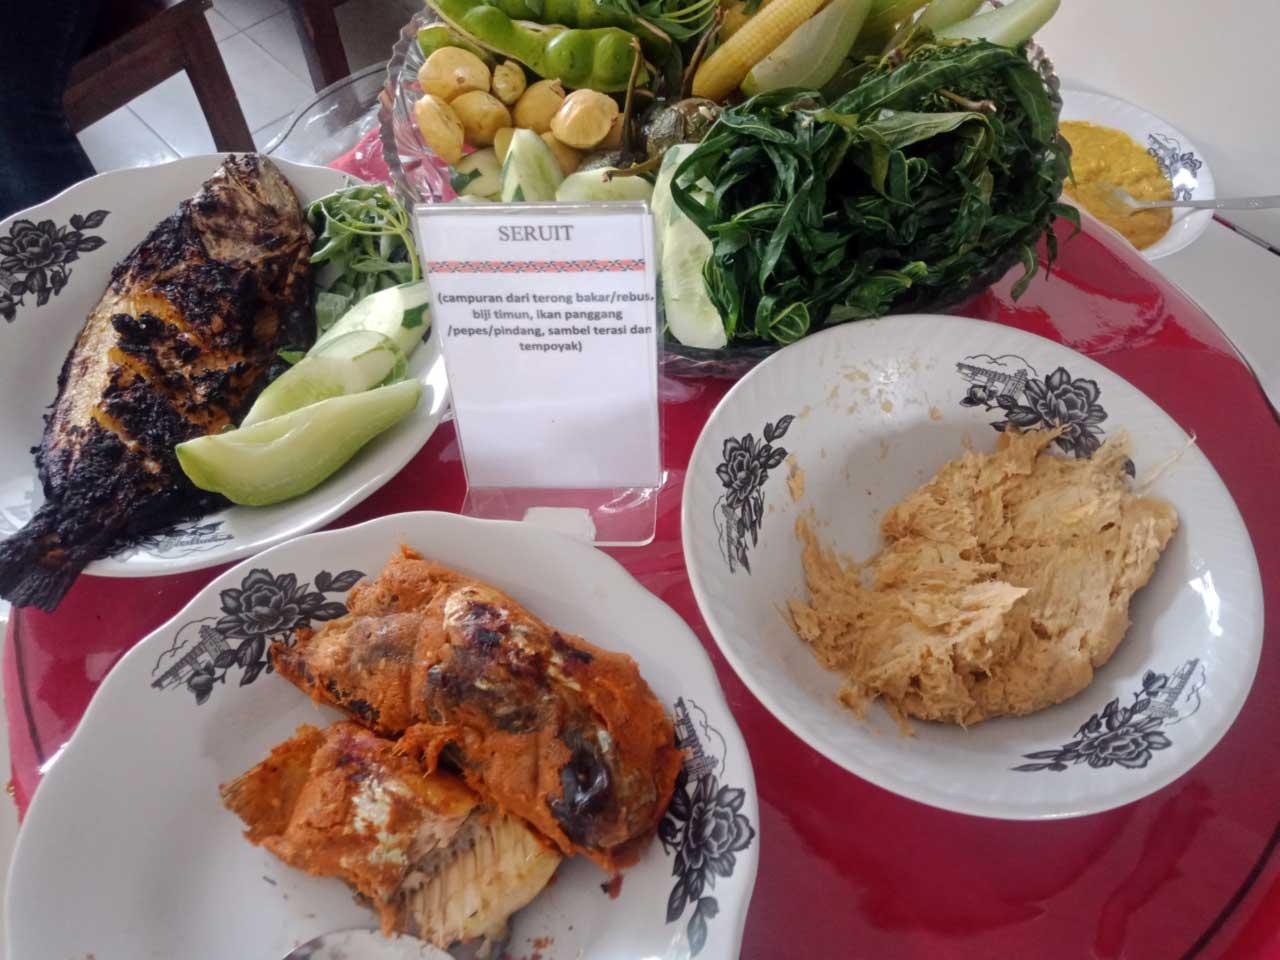 Foto Gambar Seruit - Makanan Khas Lampung - Rumah Makan Cikwo Prasmanan - kelilinglampung.net - Yopie Pangkey